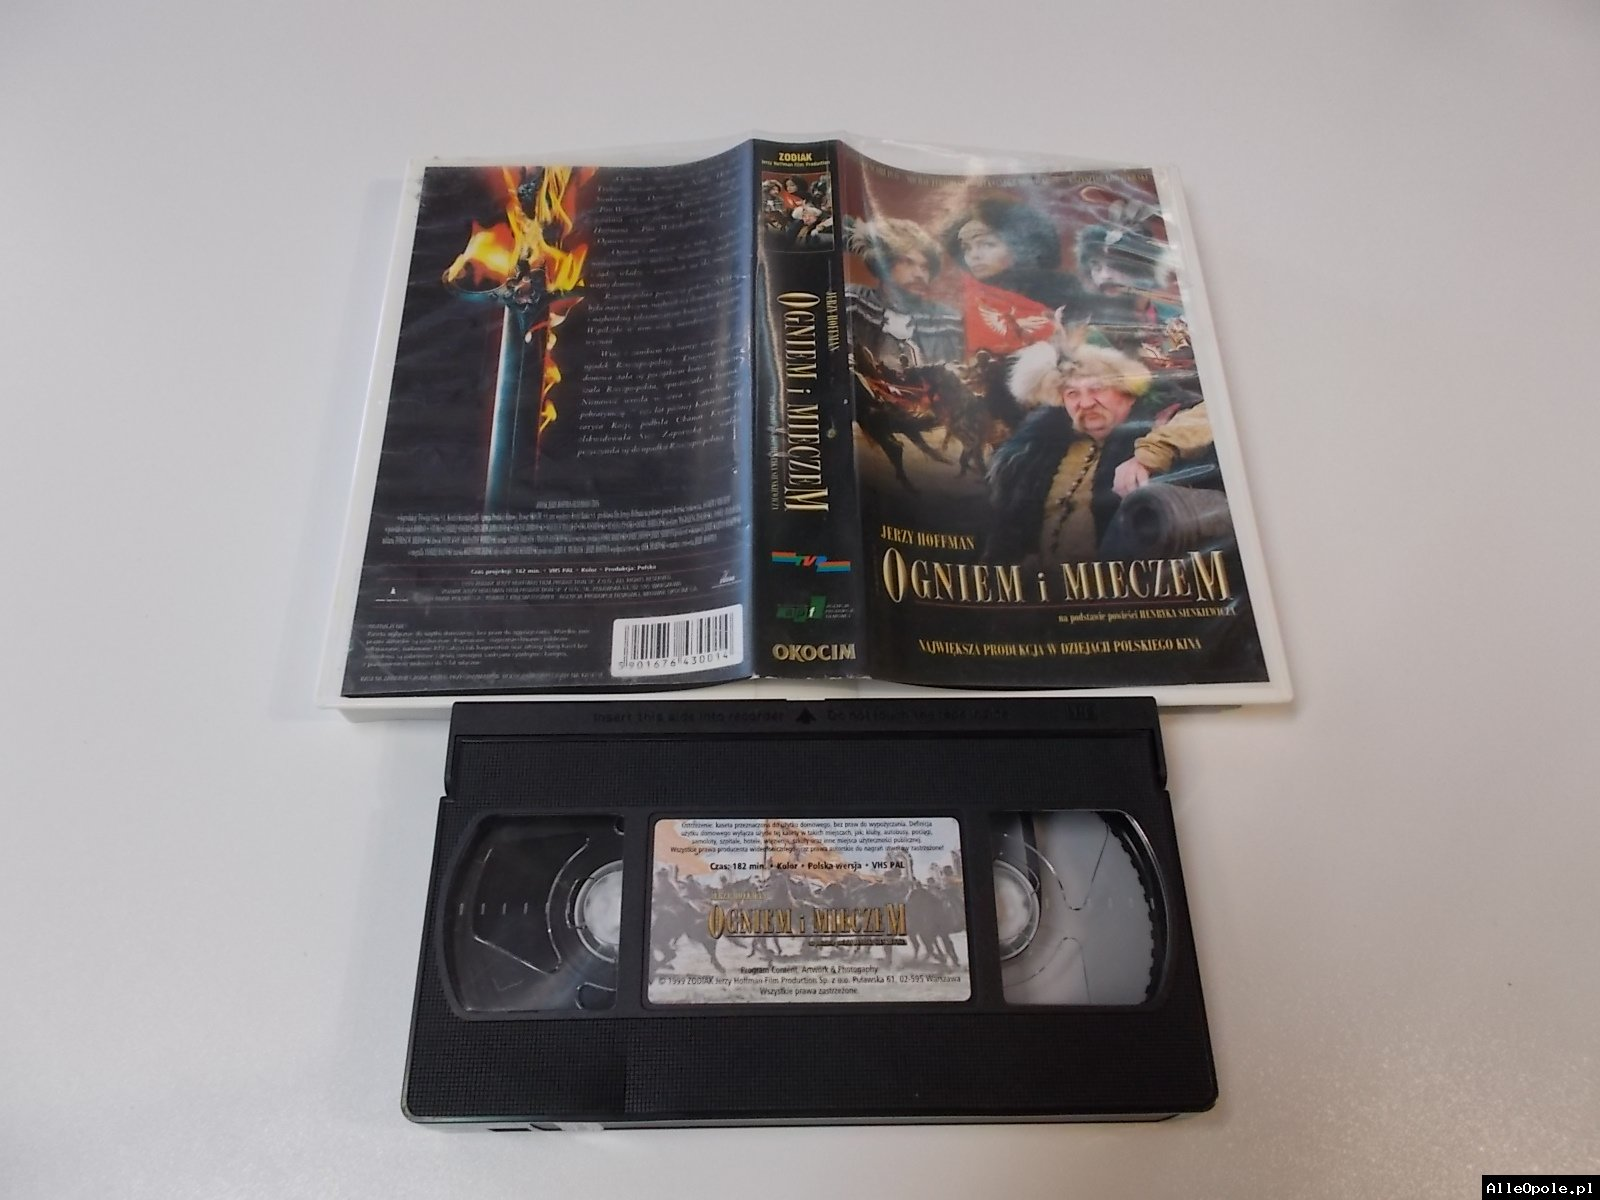 OGNIEM I MIECZEM - VHS Kaseta Video - Opole 1724